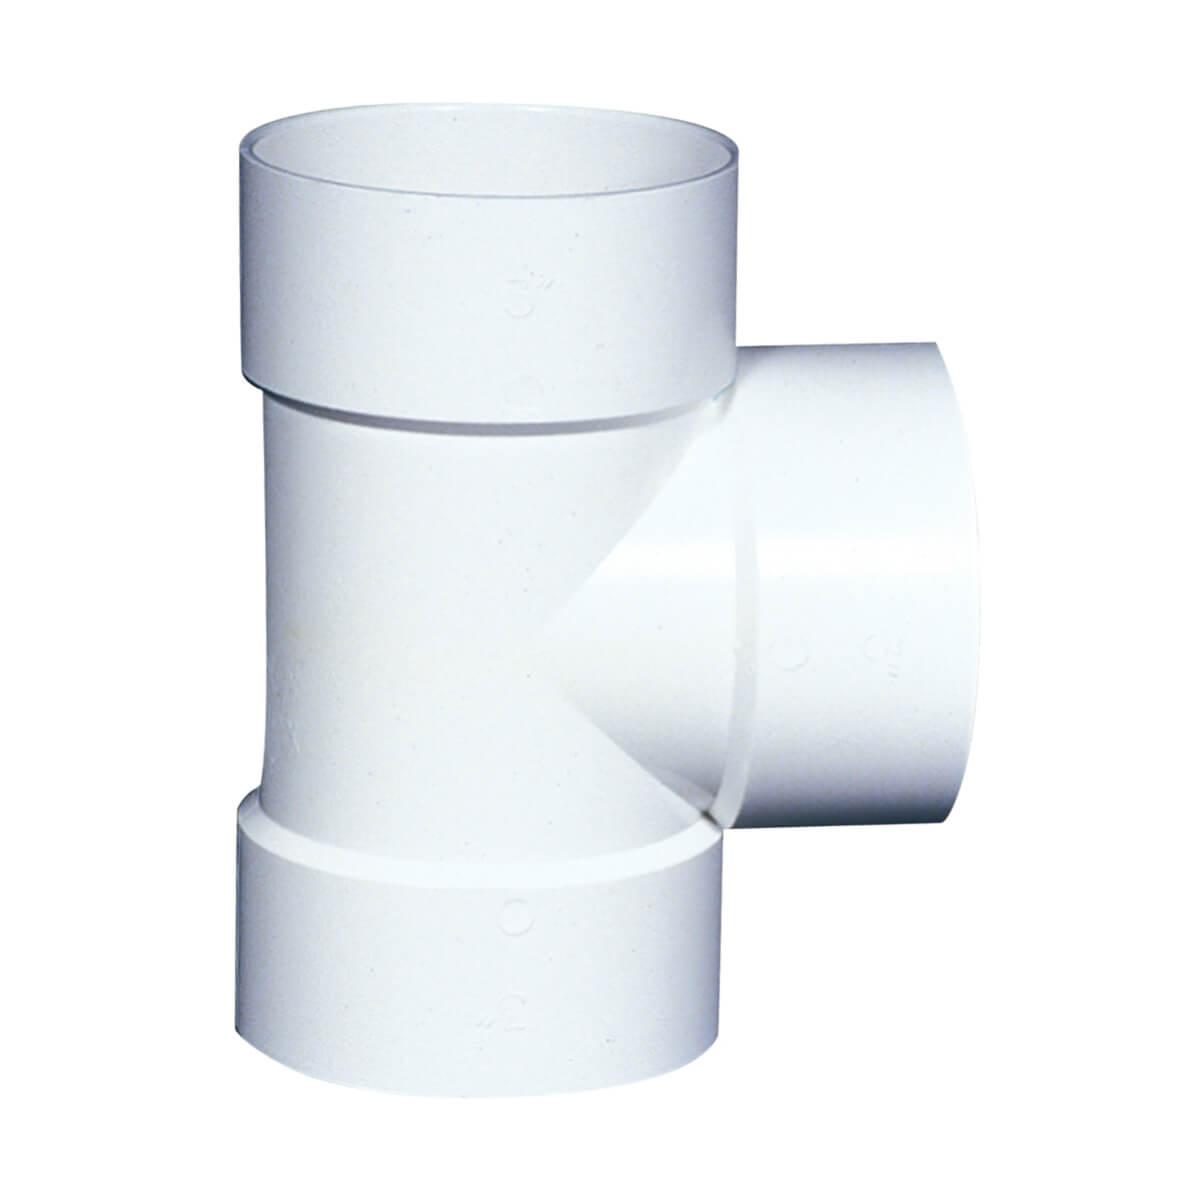 PVC-BDS Straight Tee - Hub - 4-in